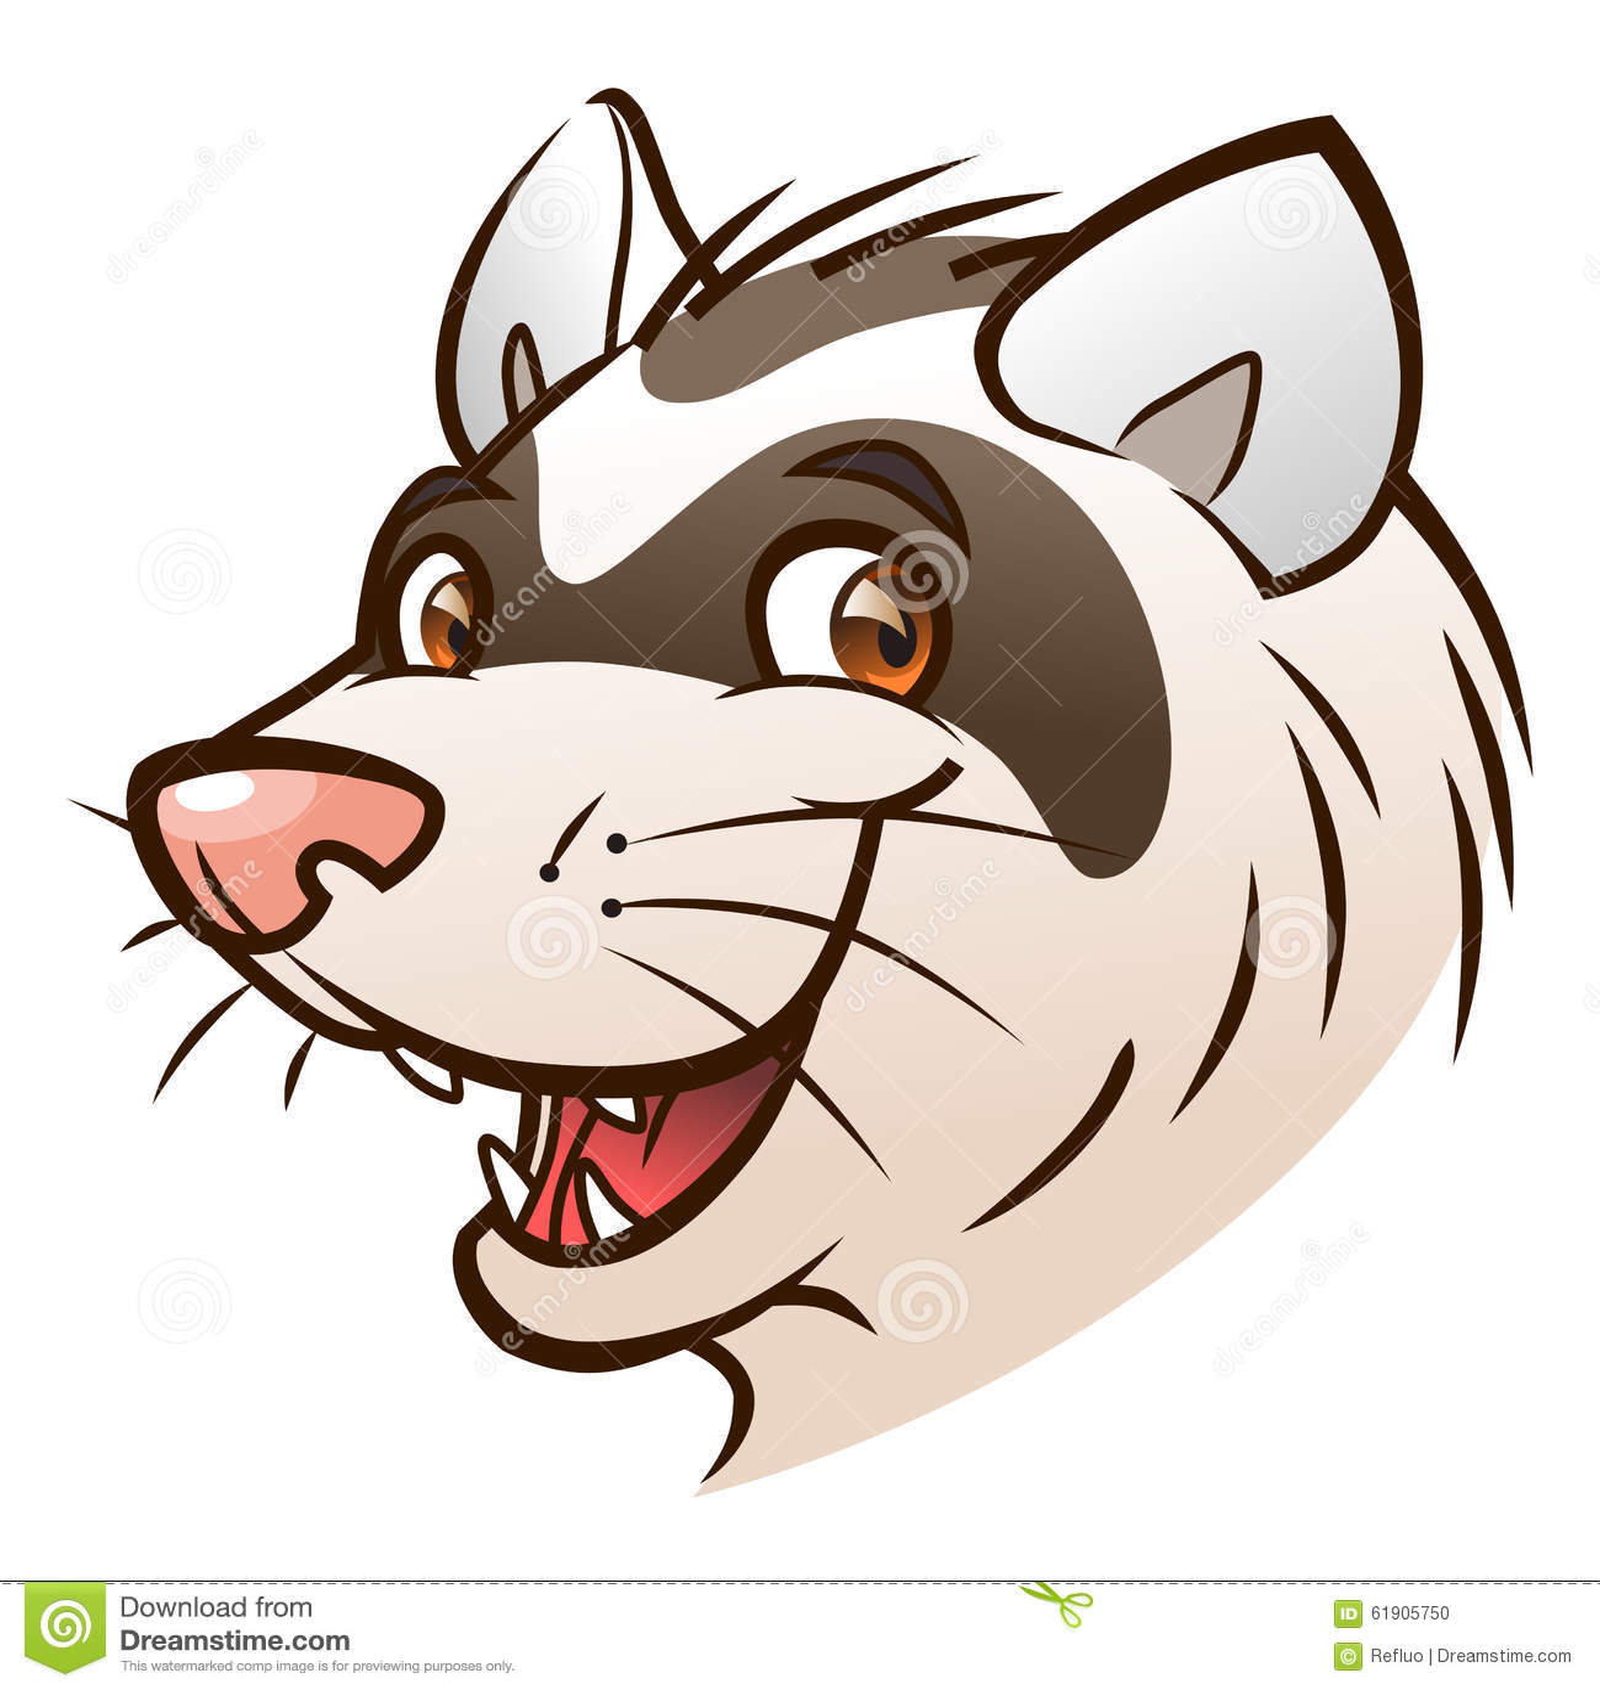 hight resolution of cartoon ferret head portrait of cartoon ferret on the white background royalty free illustration